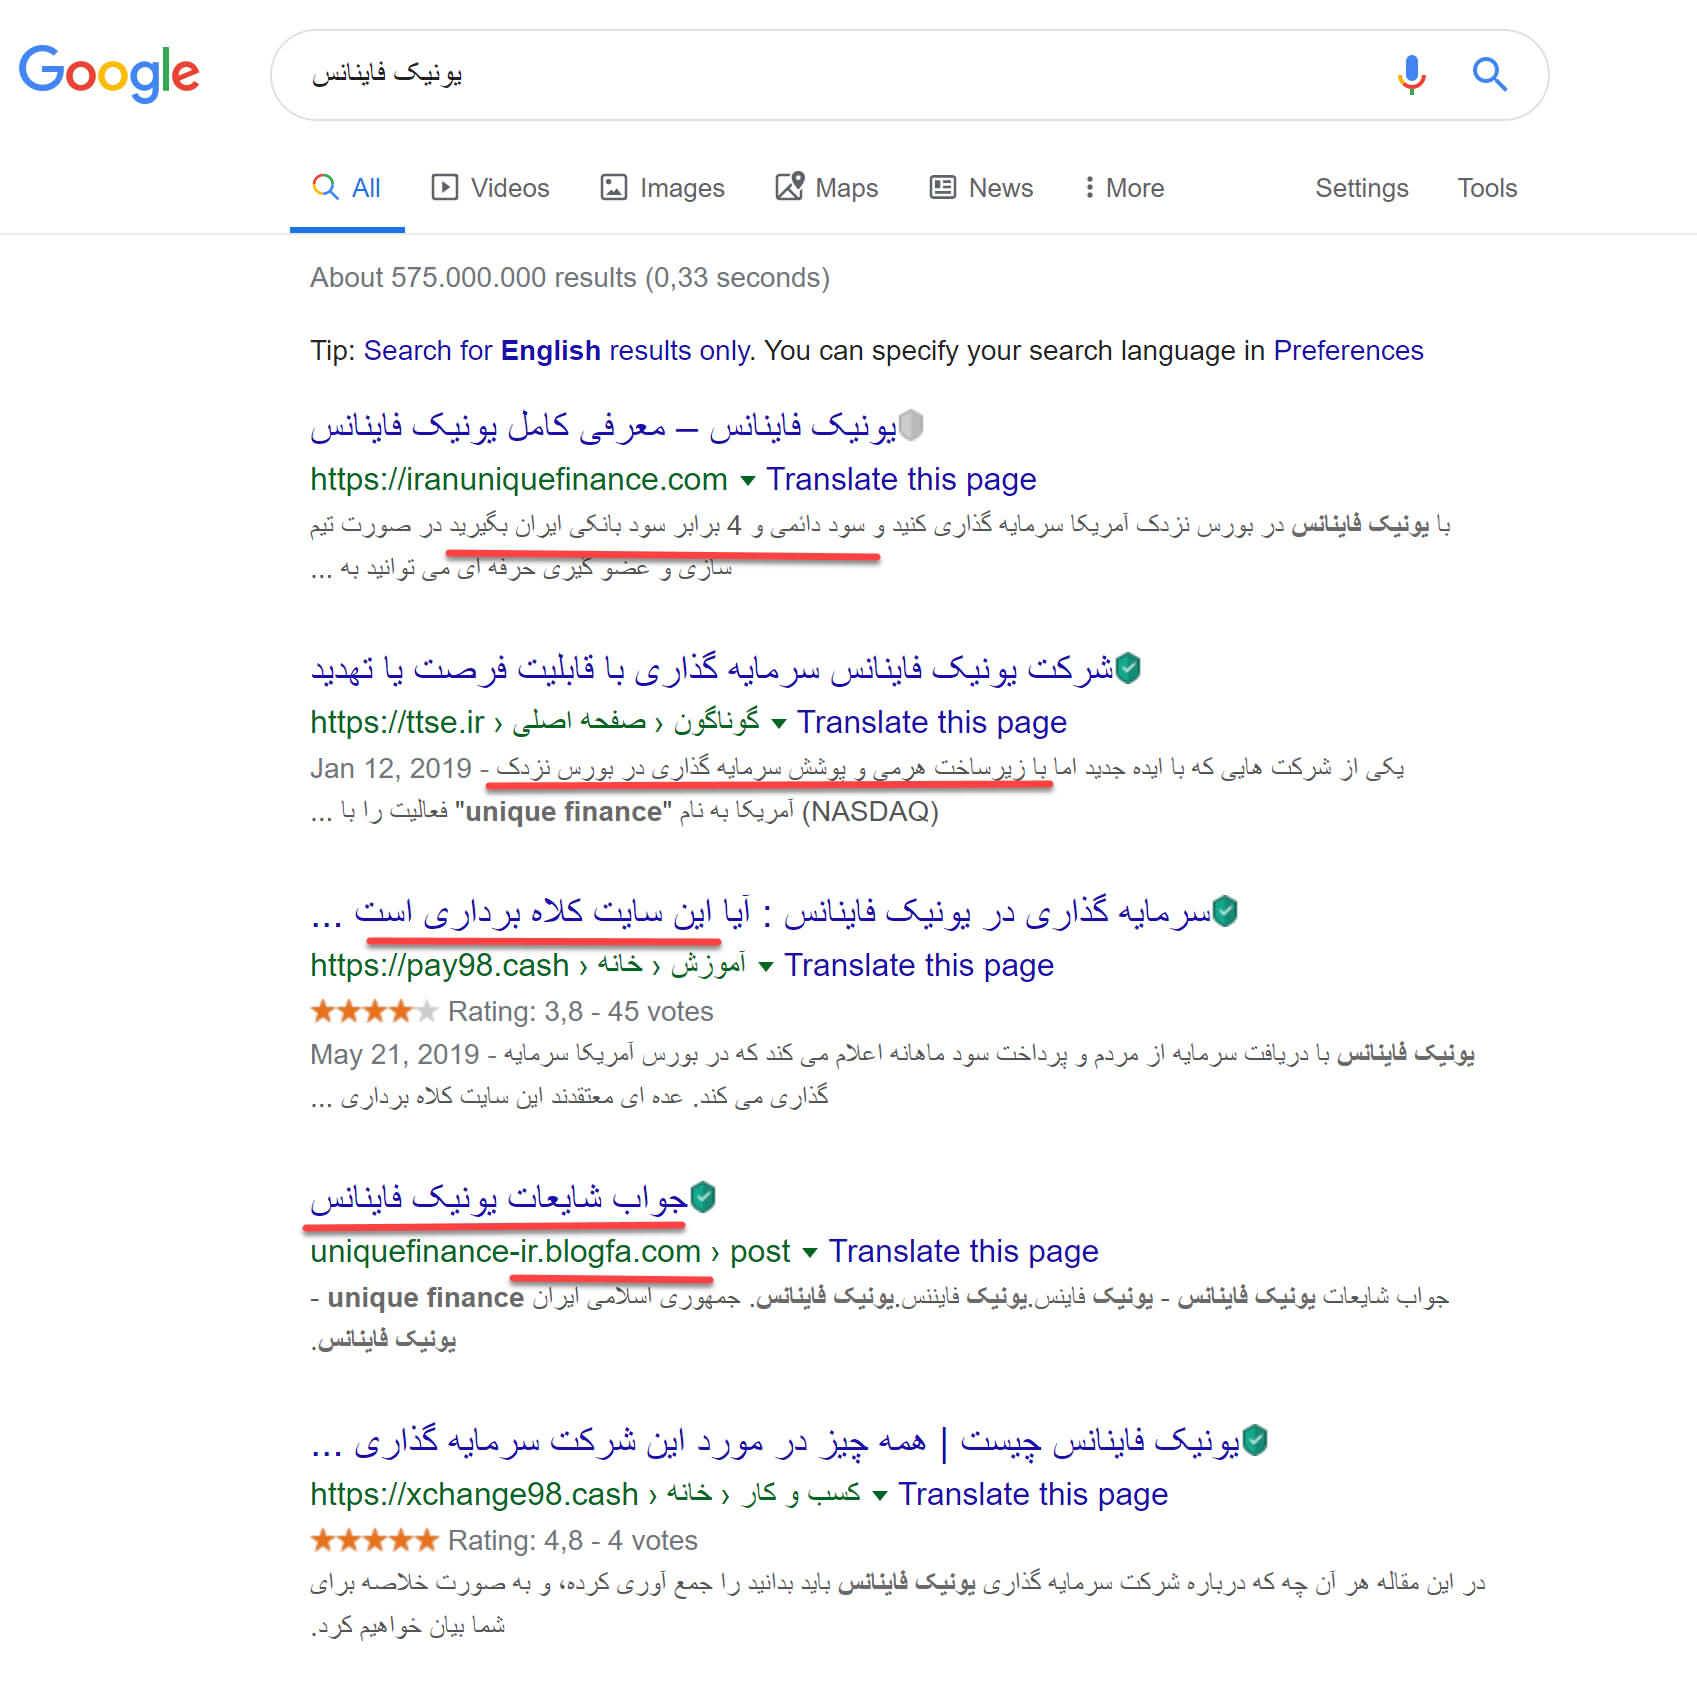 یونیک فاینانس گوگل 1